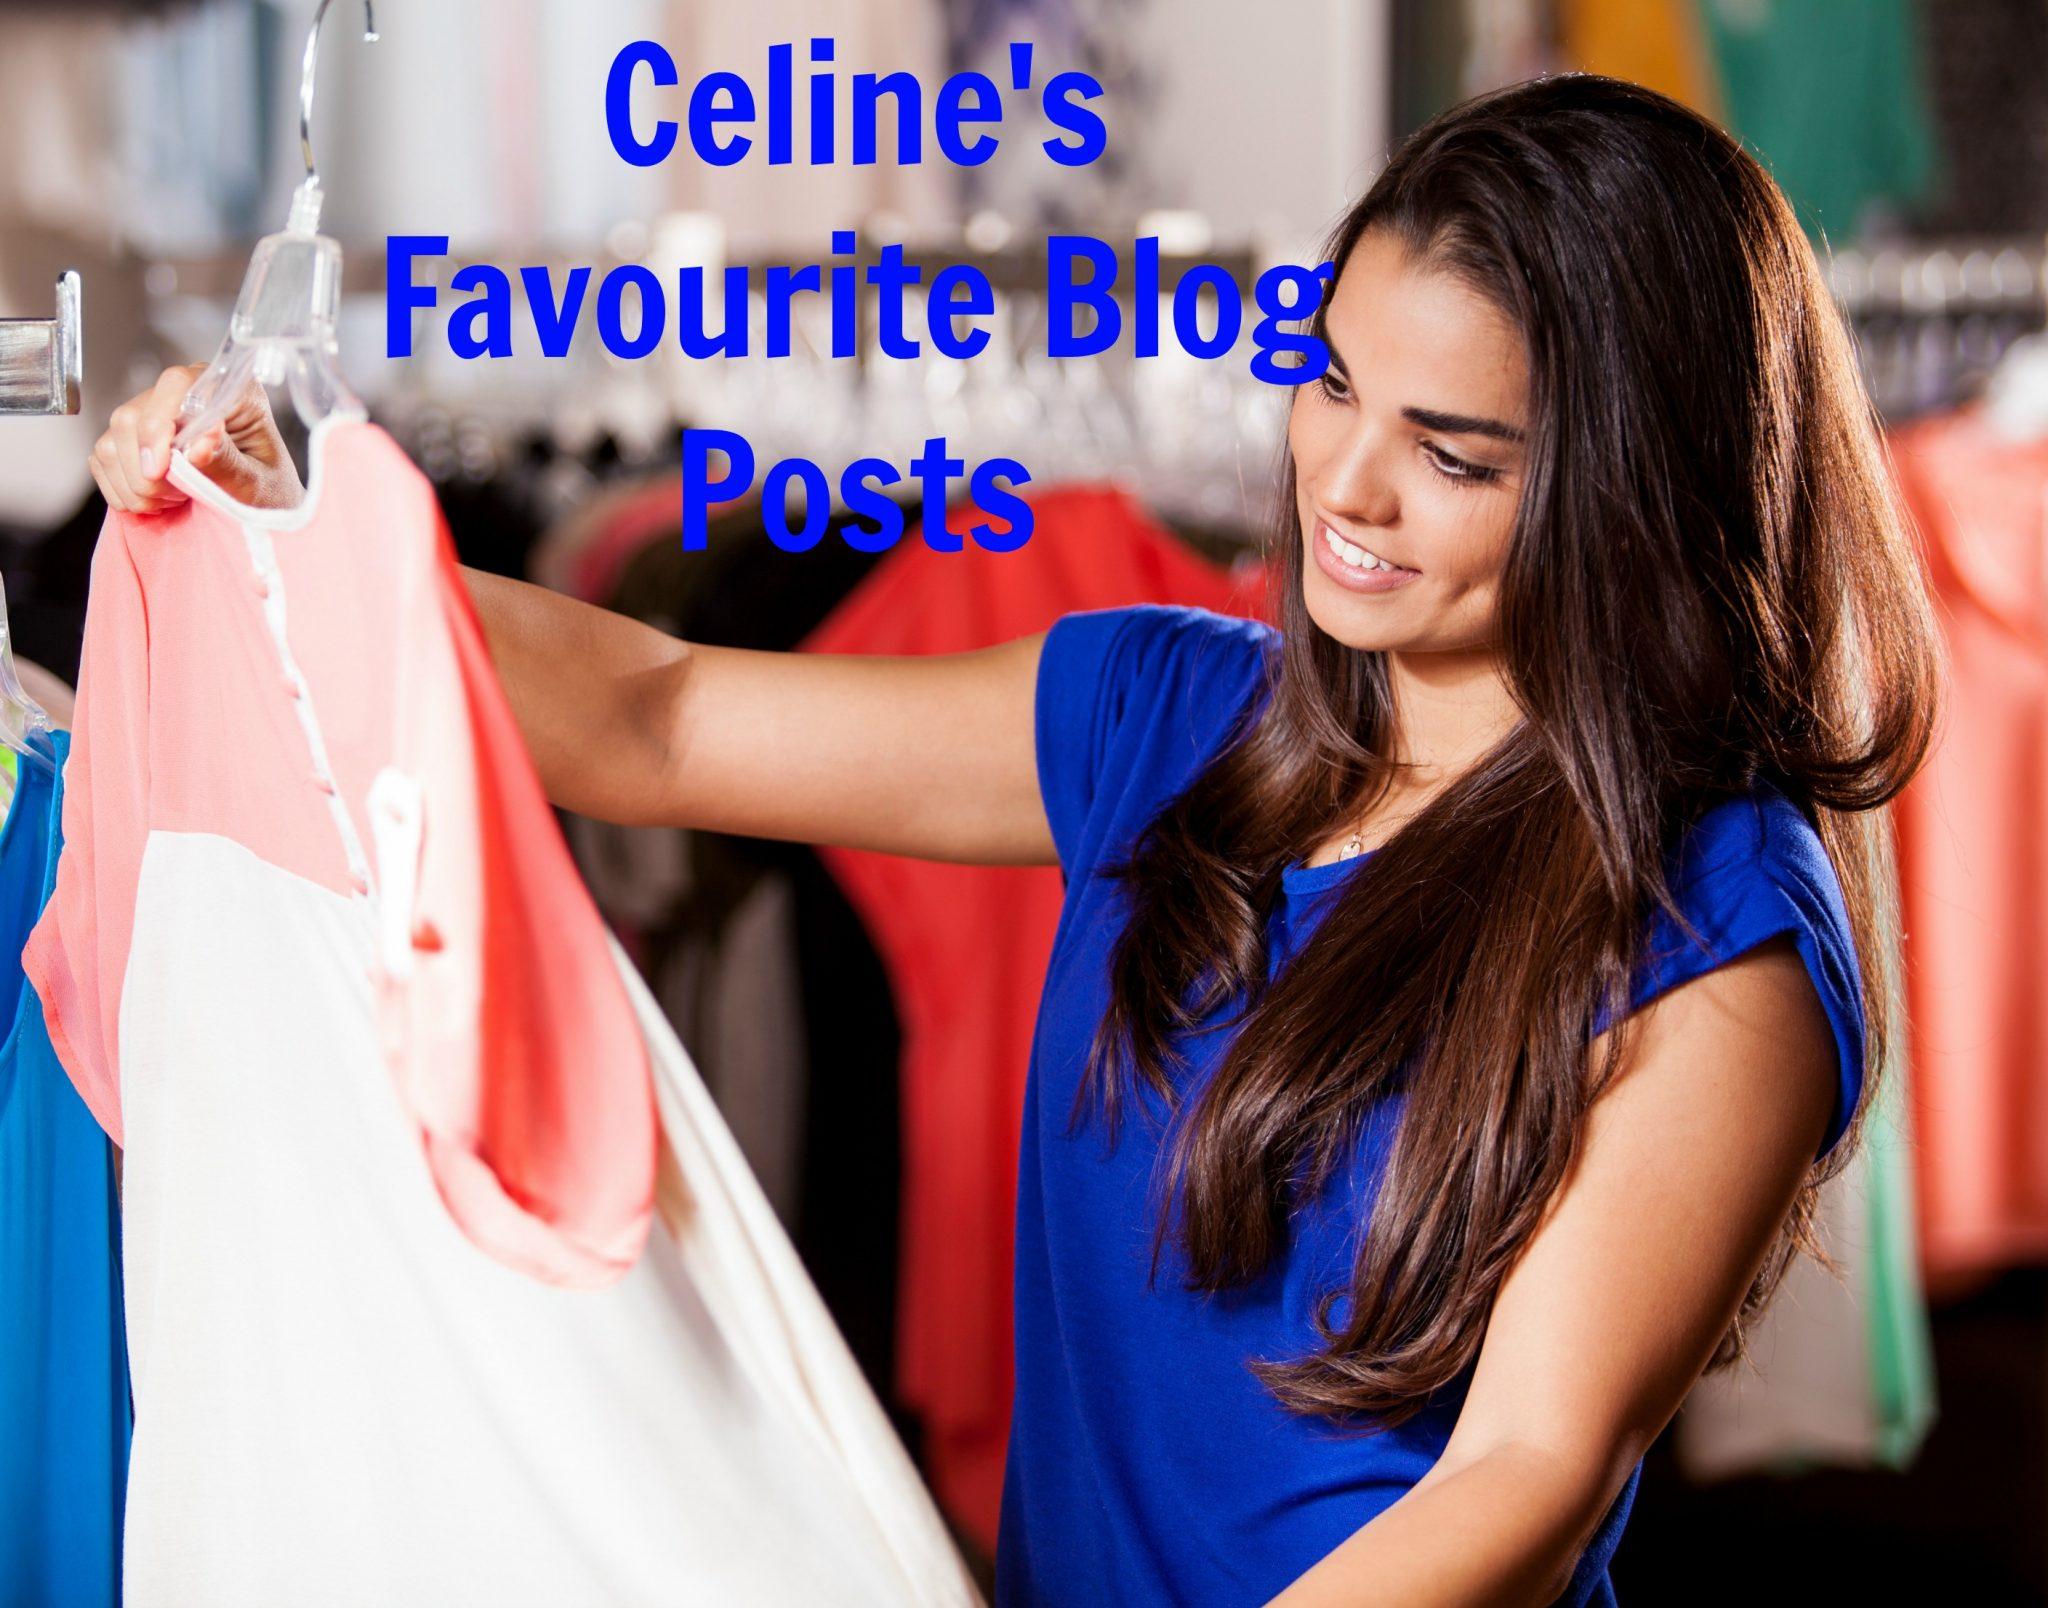 Celine's favourite blog posts